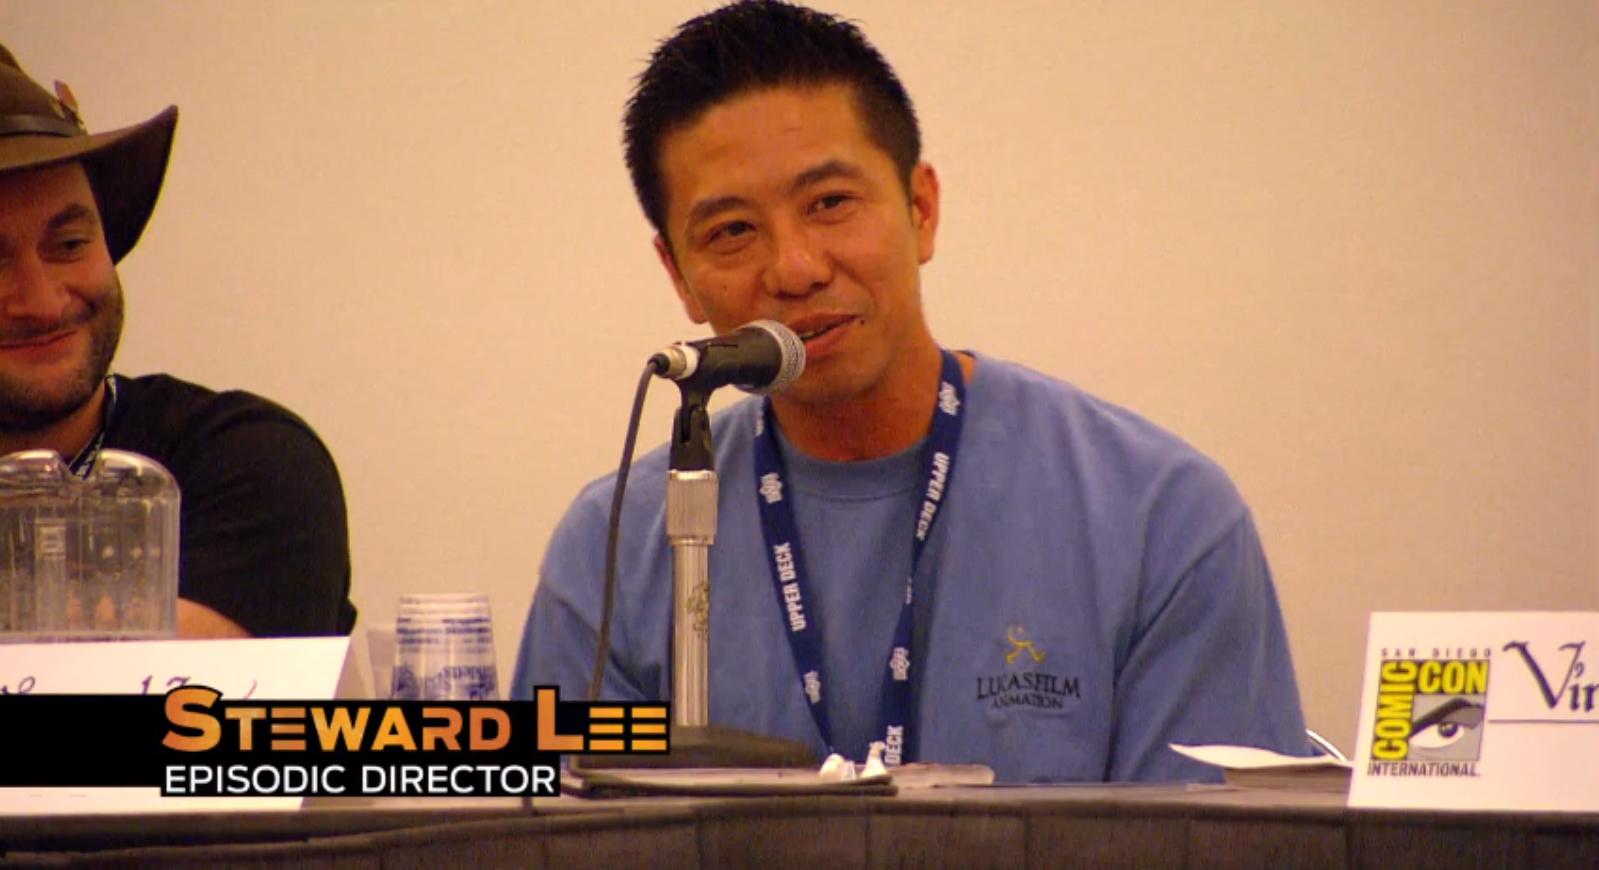 Steward Lee